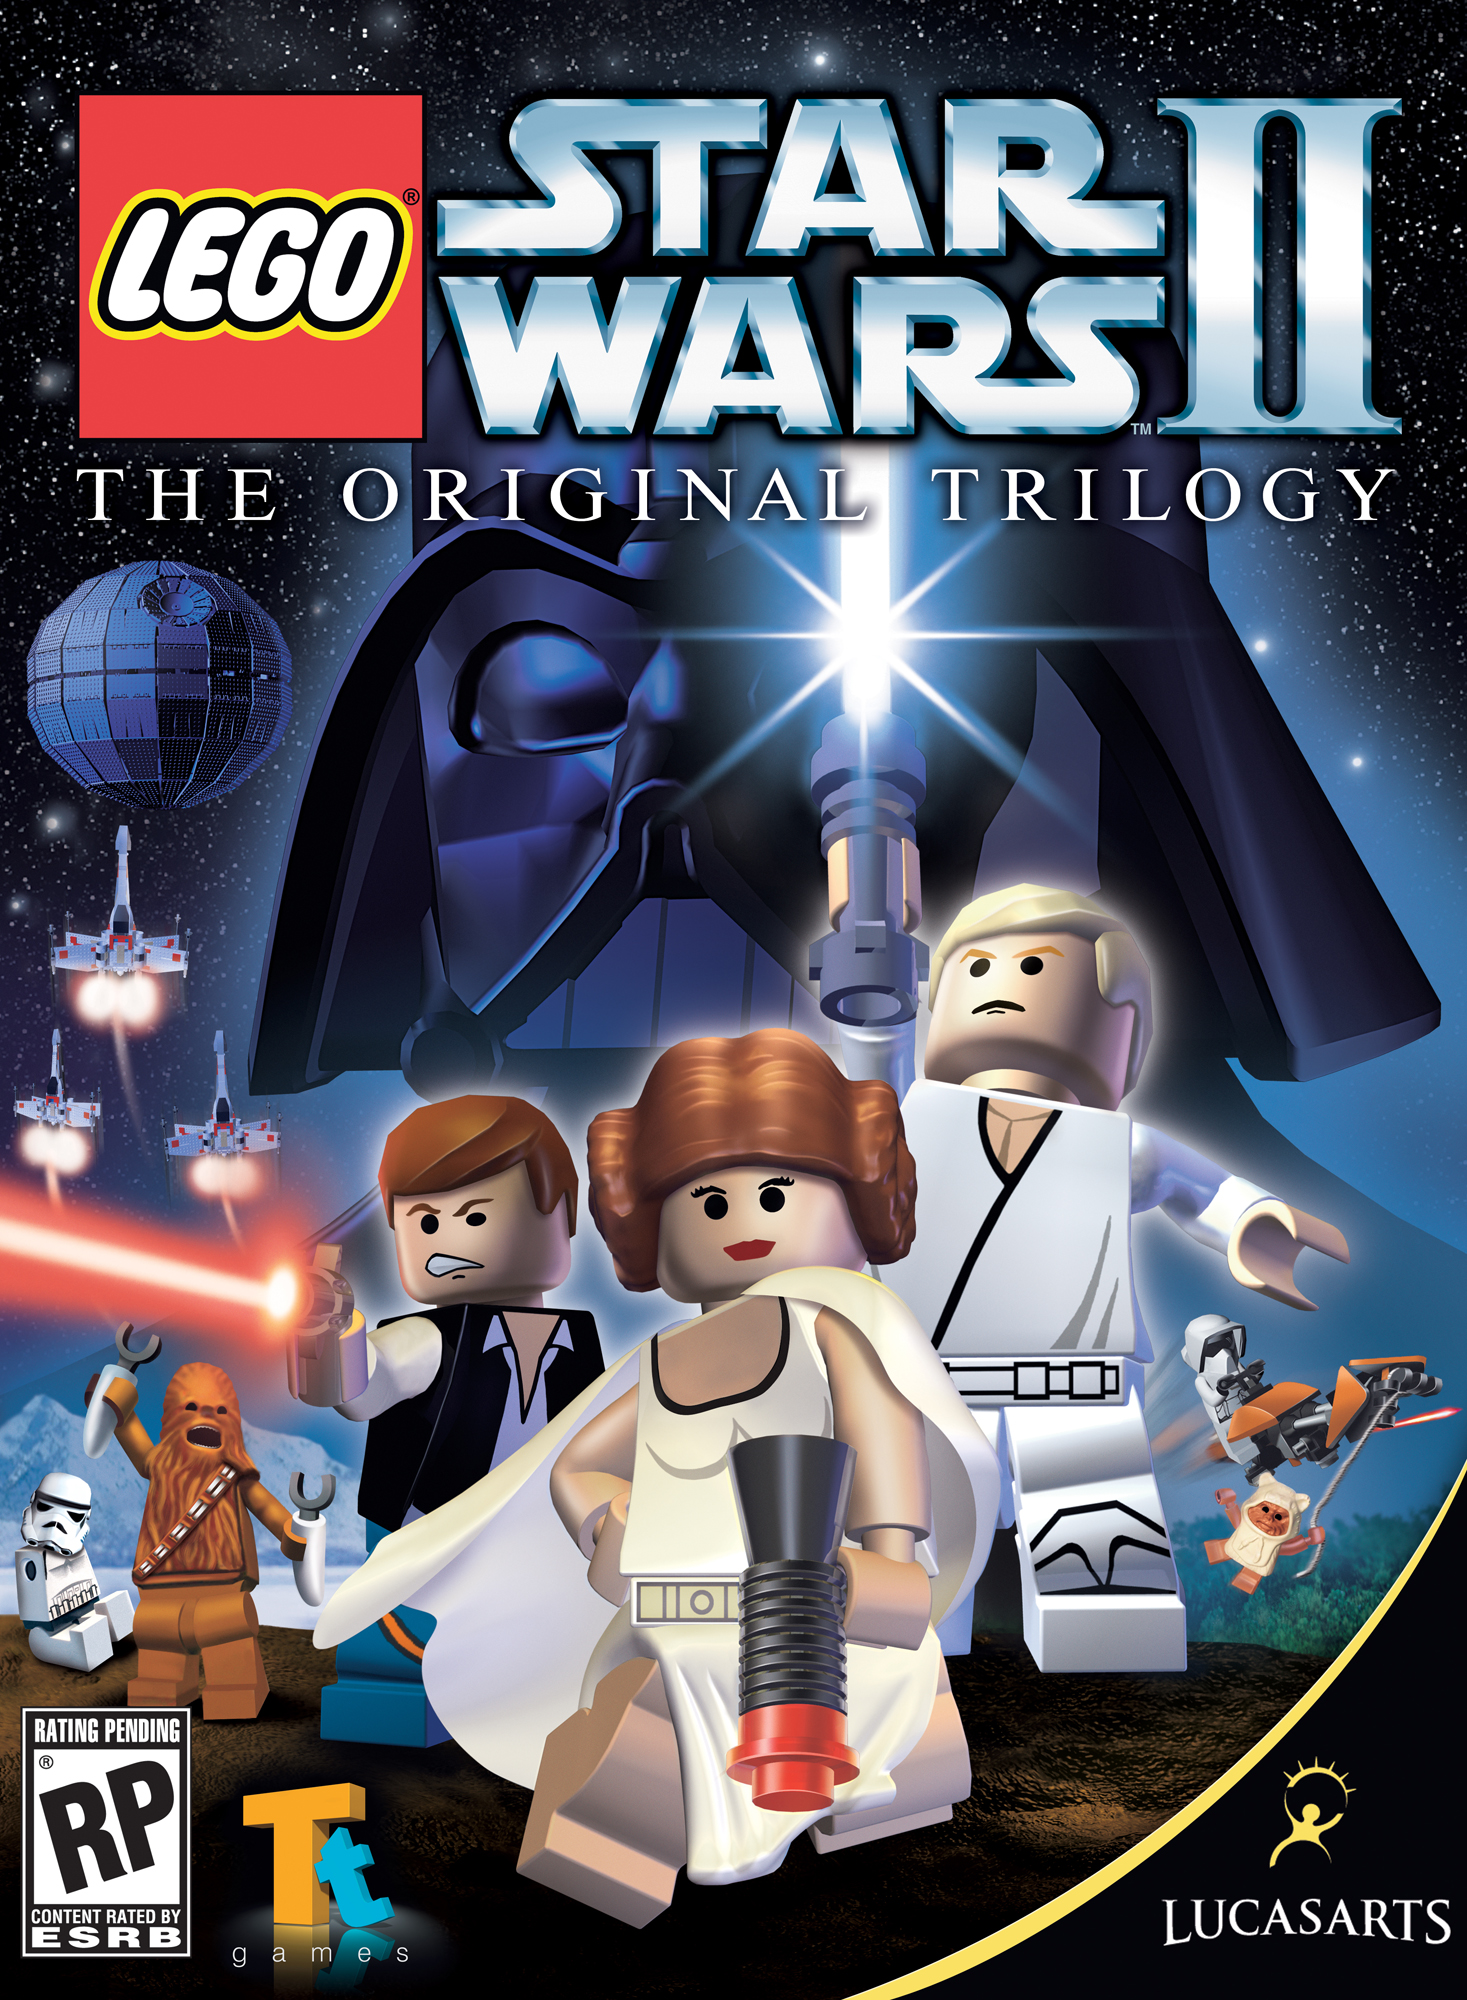 Lego Star Wars II: The Original Trilogy (Video Game 2006) - IMDb